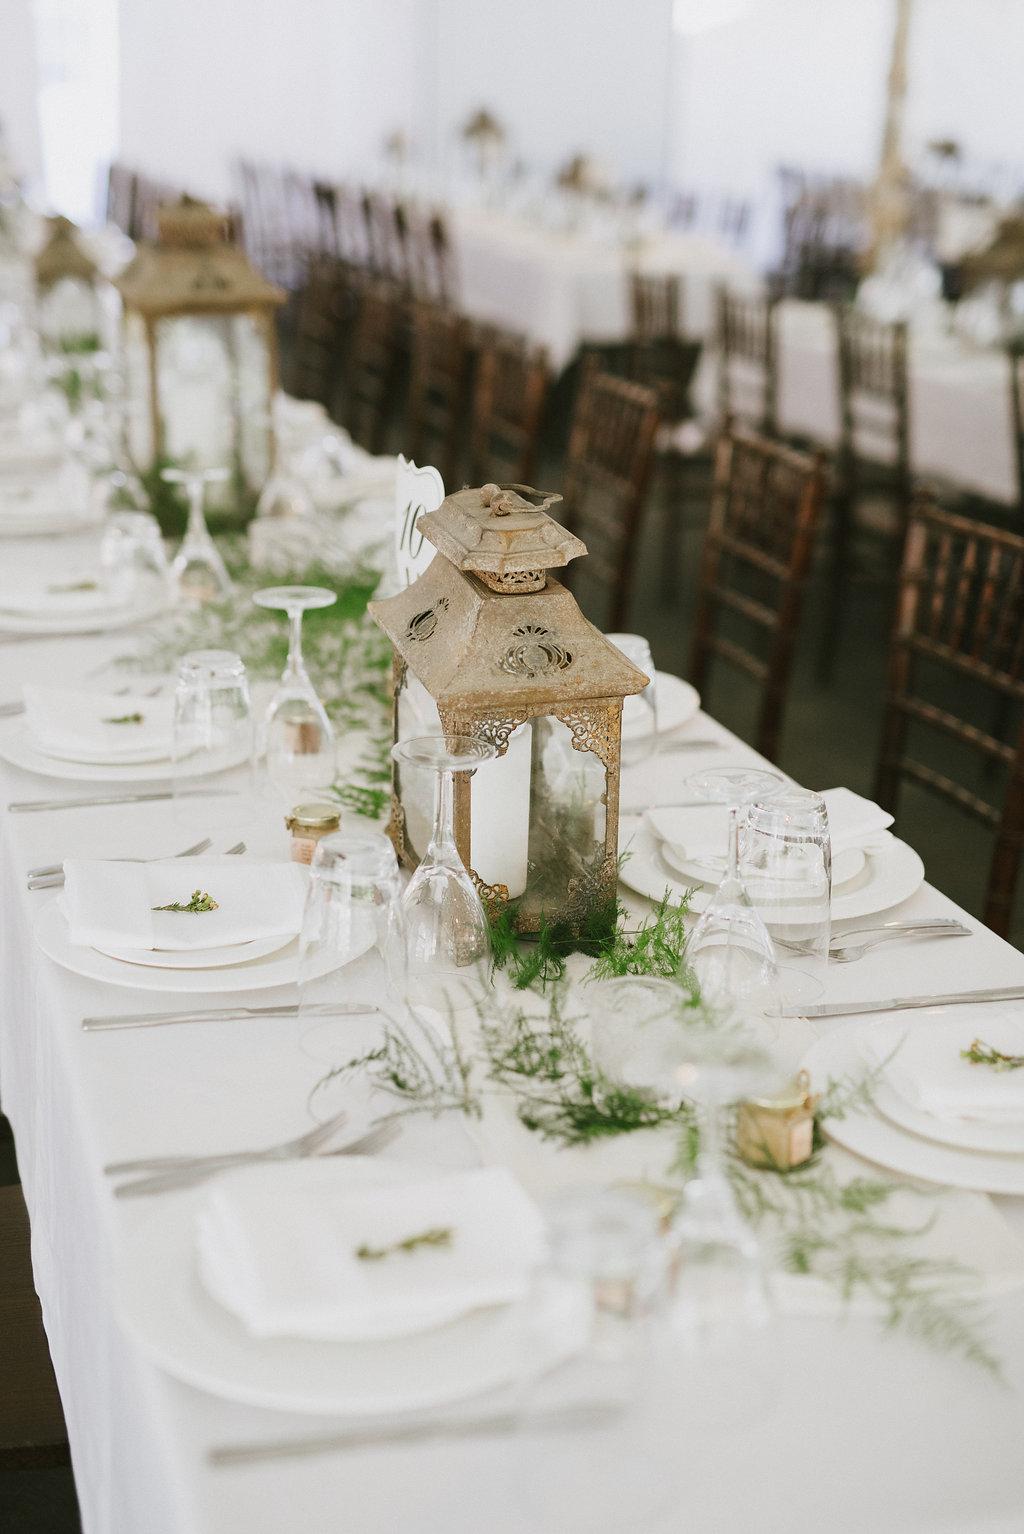 Pineridge Hollow Wedding - Greenery Wedding Decor